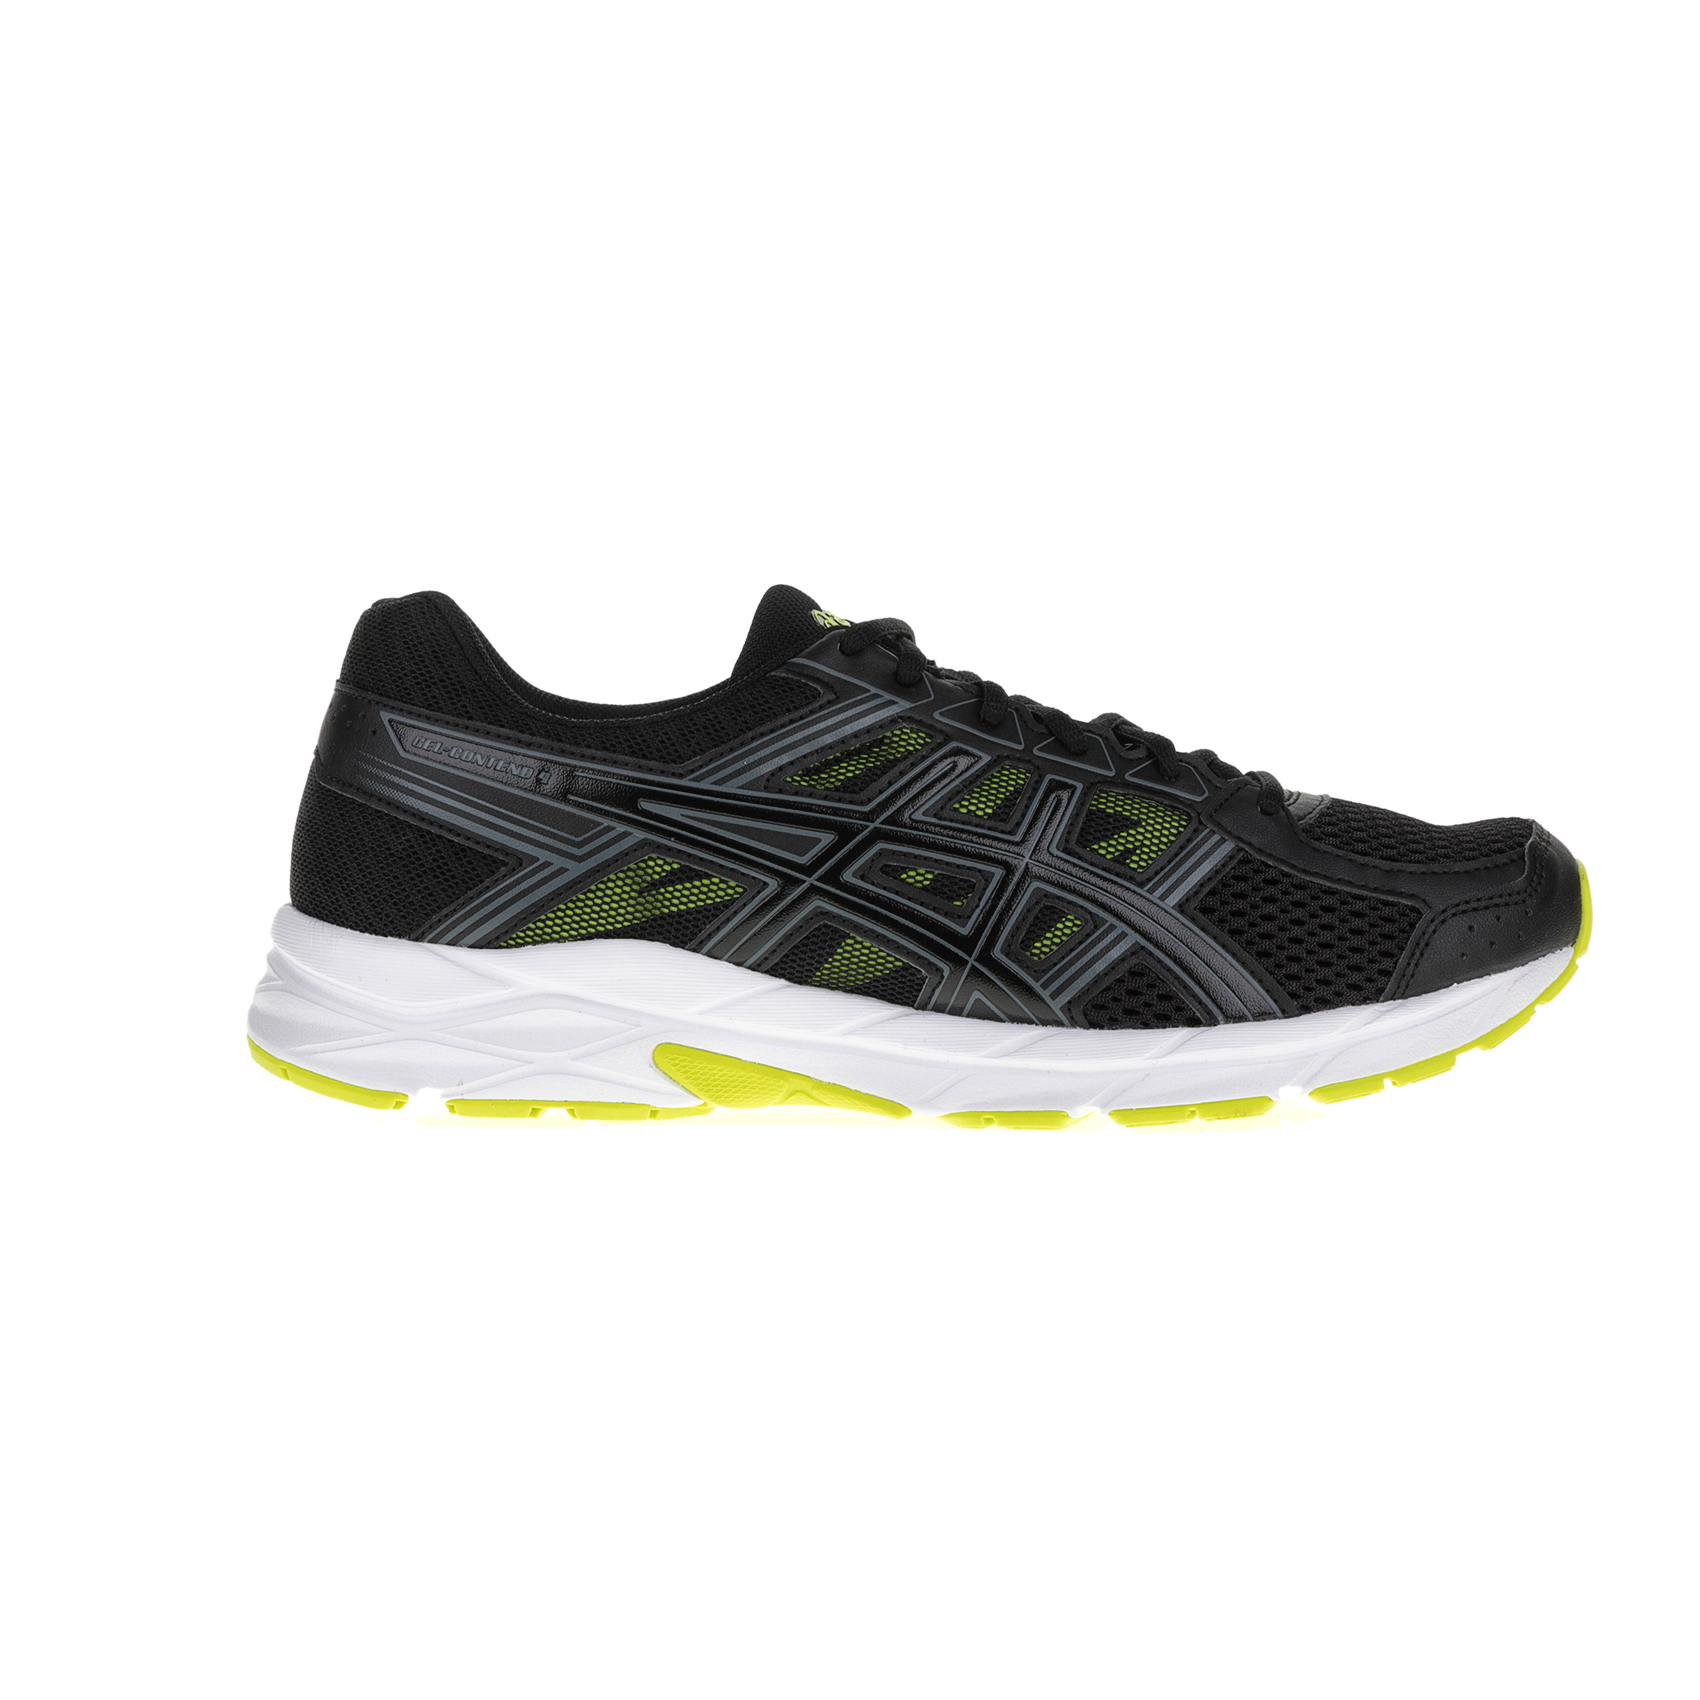 ASICS - Ανδρικά αθλητικά παπούτσια ASICS GEL-CONTEND 4 μαύρα ανδρικά παπούτσια αθλητικά running